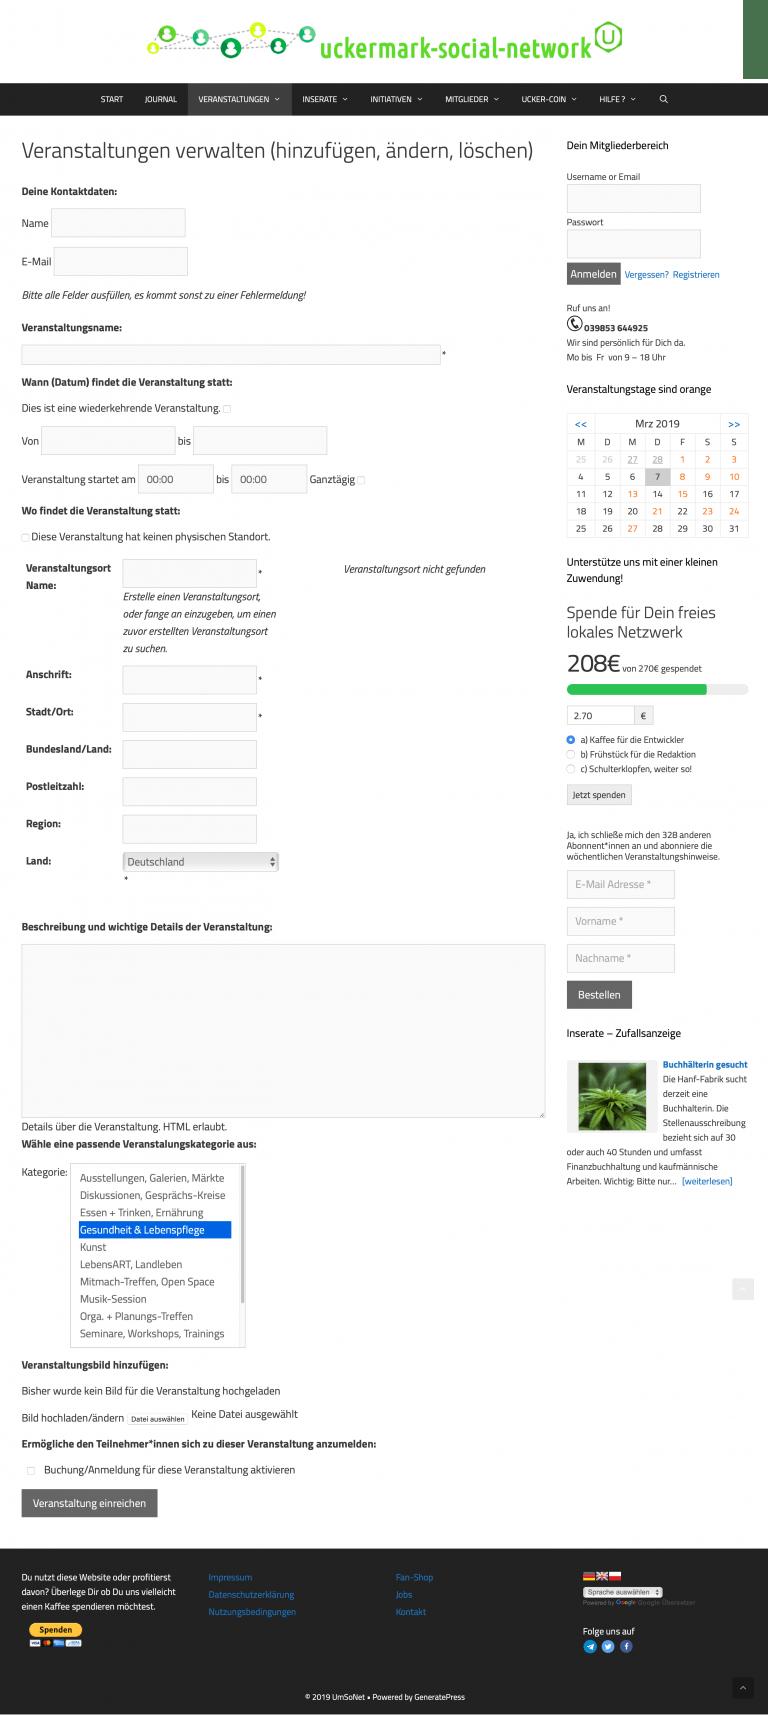 uckermark-social-network